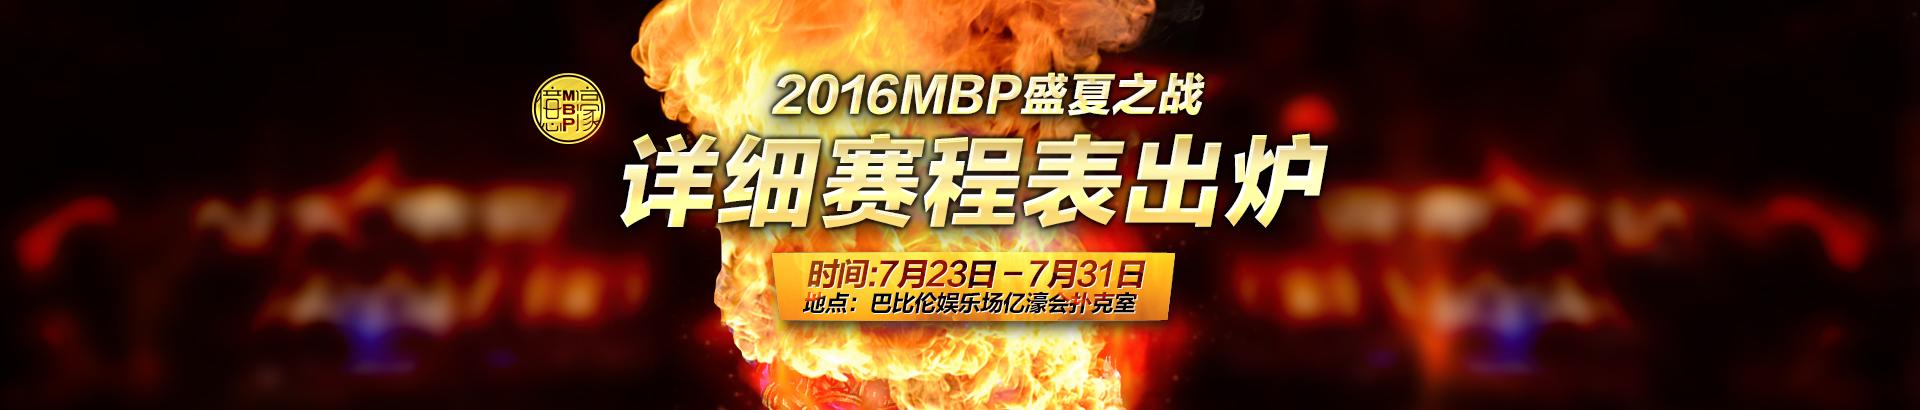 2016 MBP盛夏之战赛程表出炉